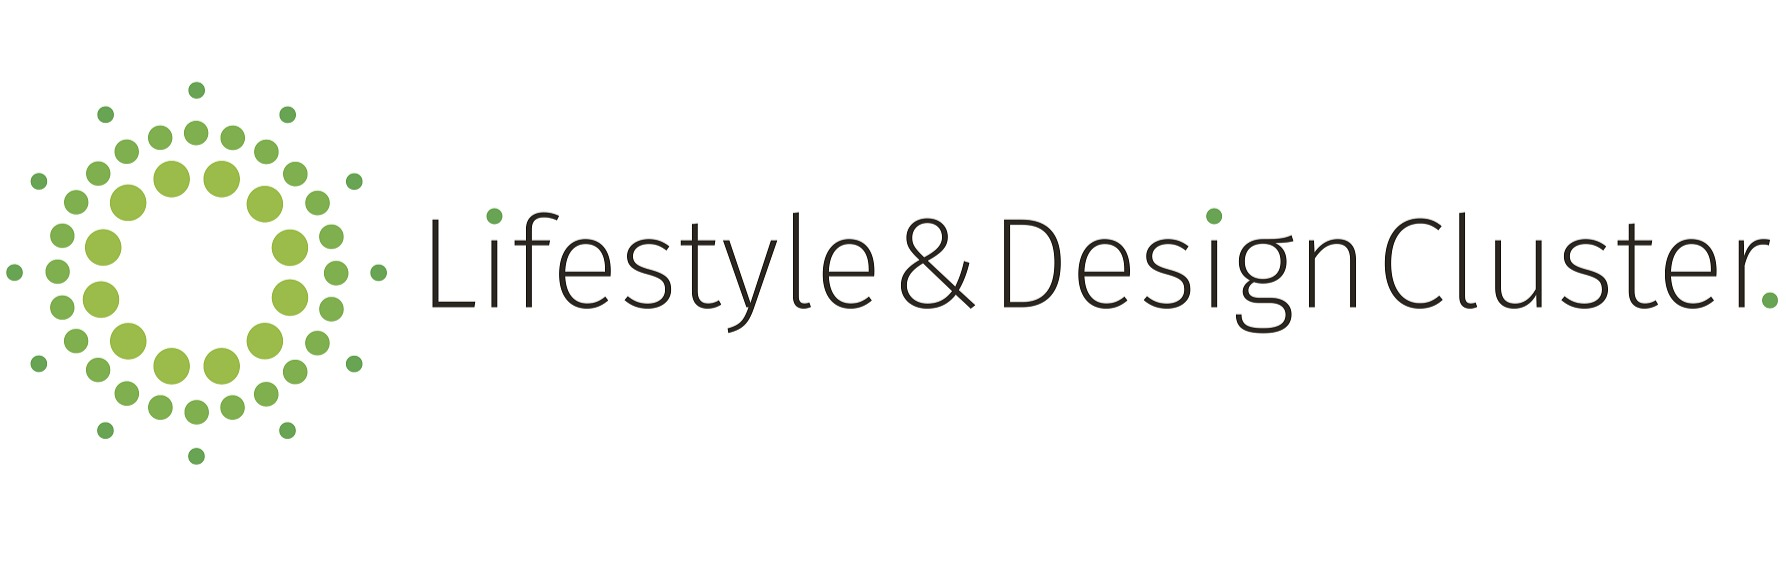 lifestyledesigncluster-positiv_orig_edit